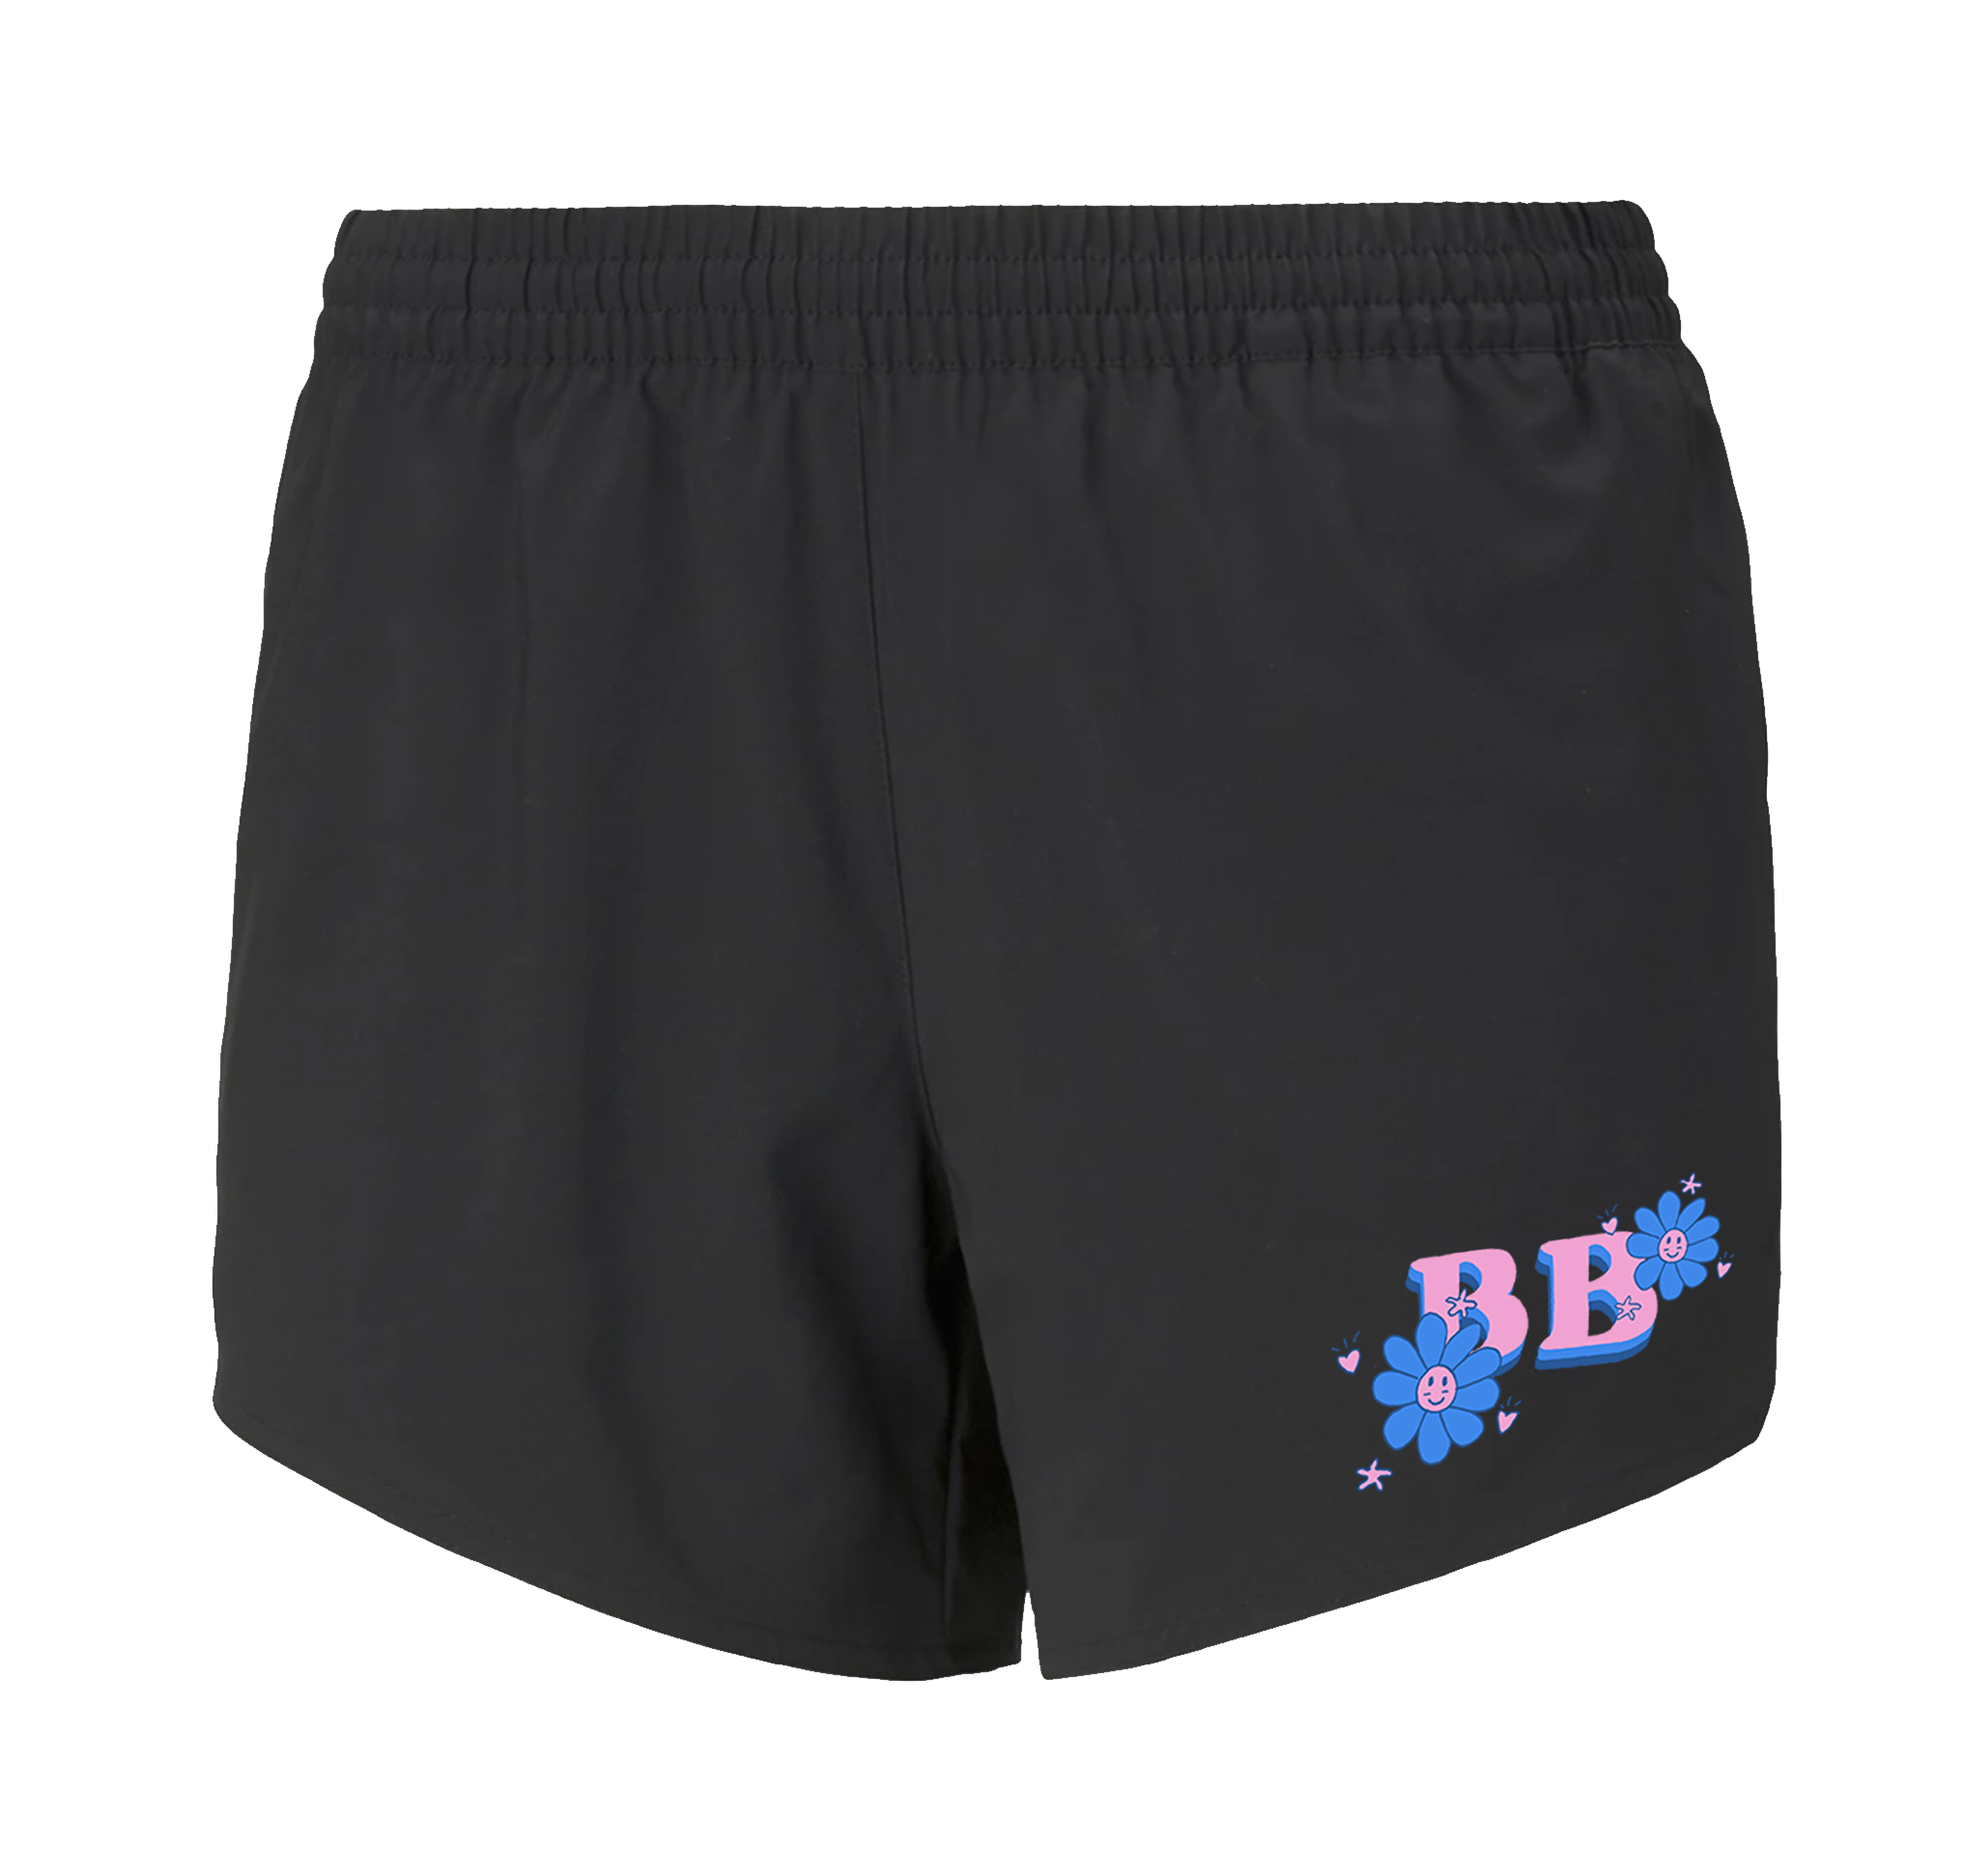 BB Short Shorts